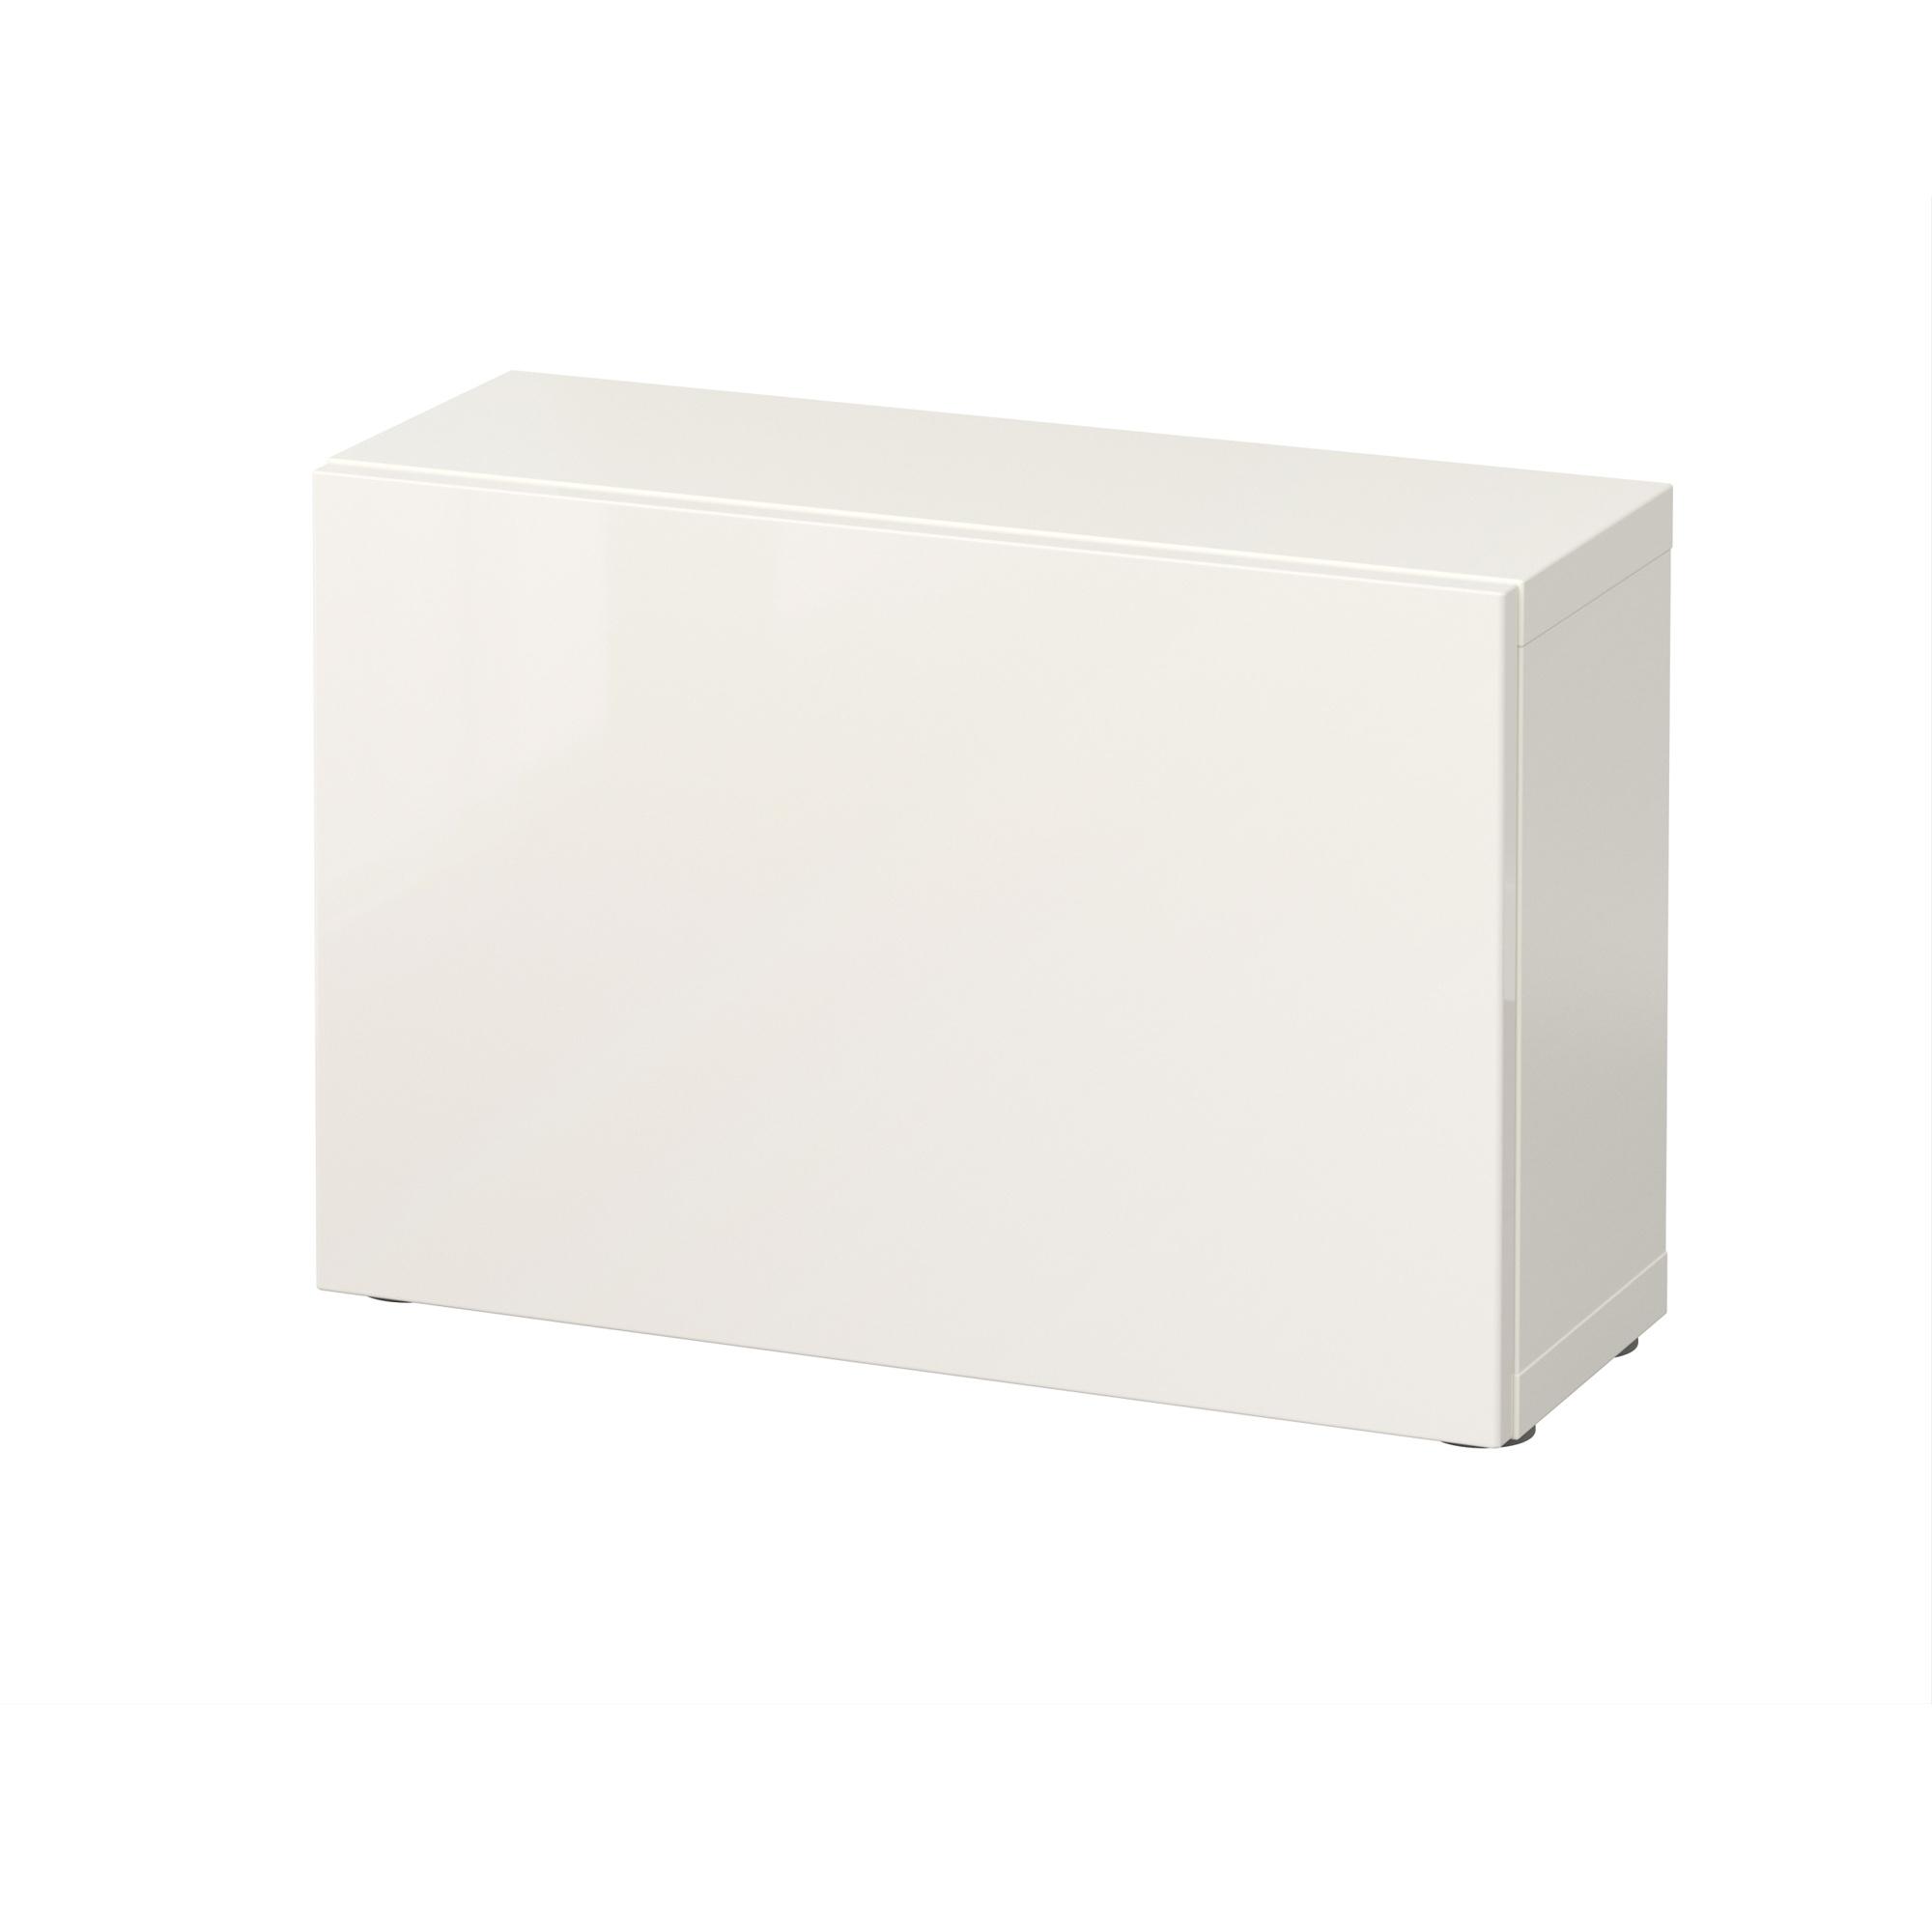 Best estante con puerta - Ikea tenerife productos ...